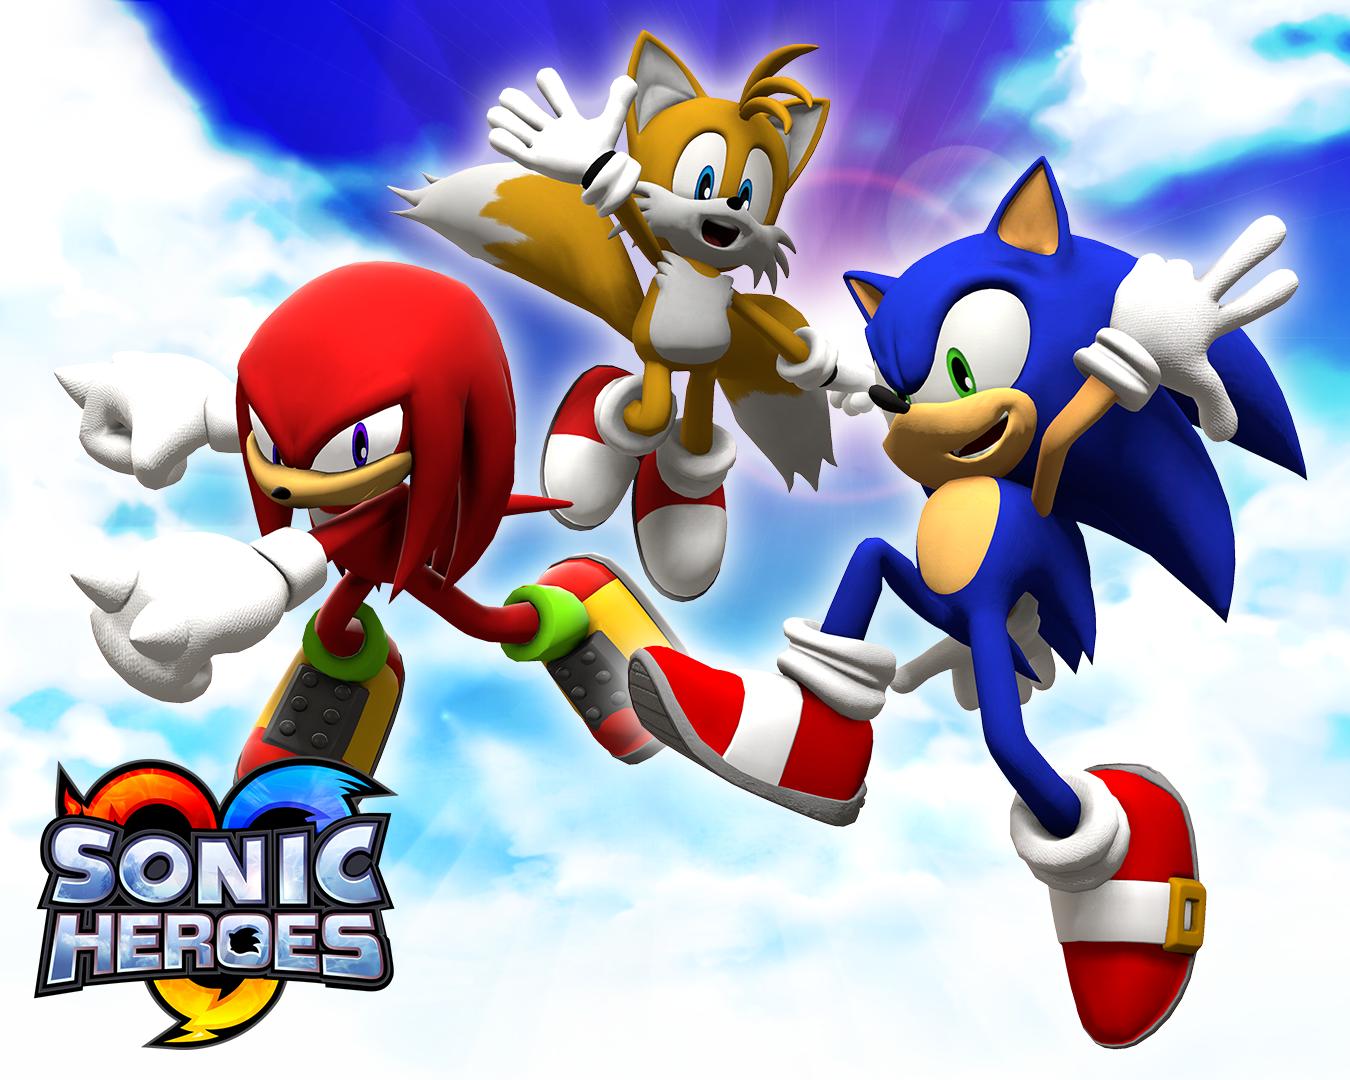 Sonic Heroes WallPaper by Lucas-da-Hedgehog